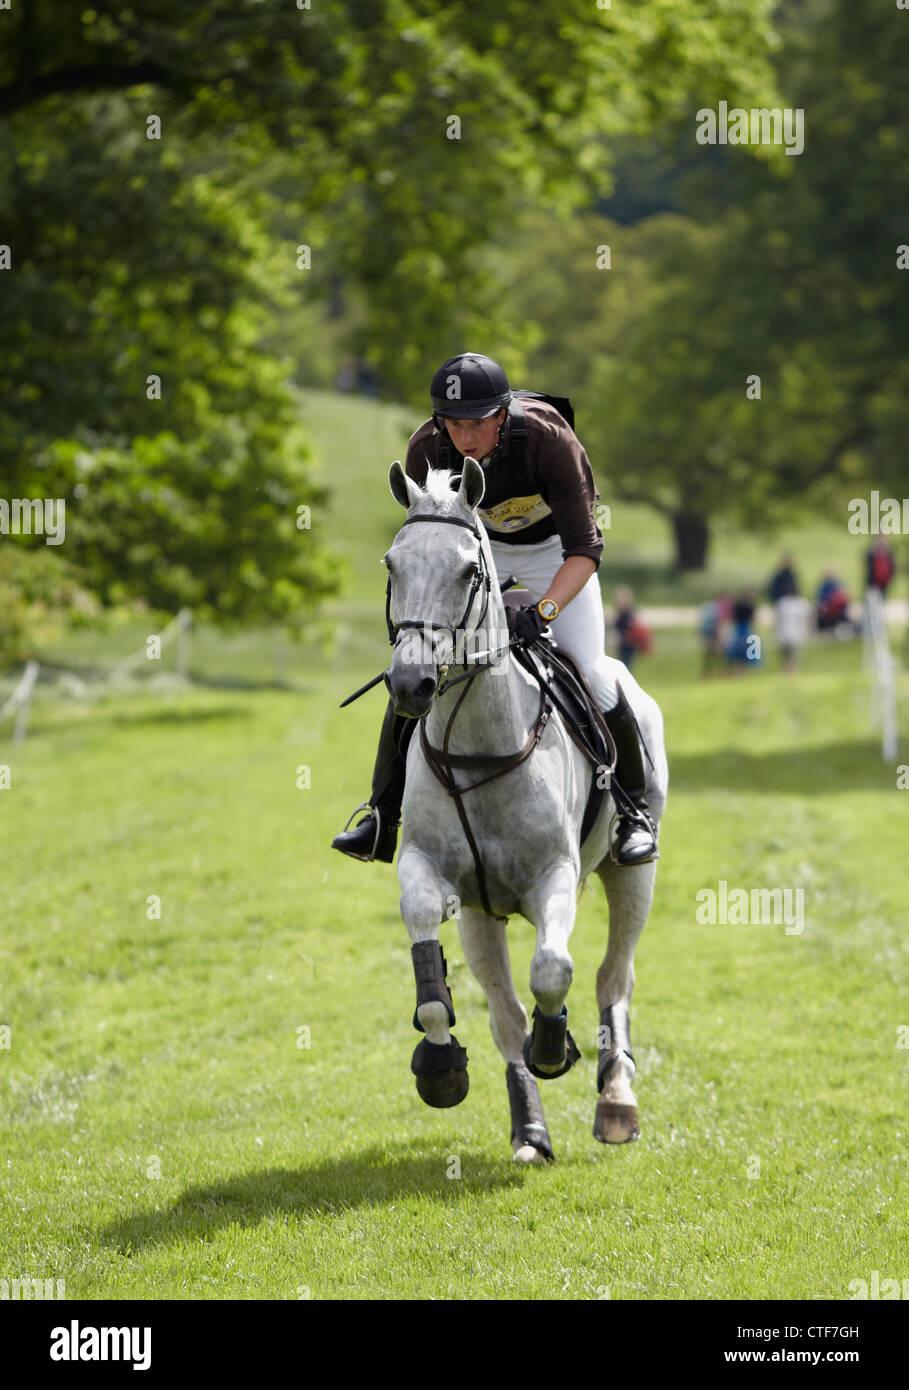 HORSE AND RIDER BRAMHAM HORSE TRIALS 2012 - Stock Image